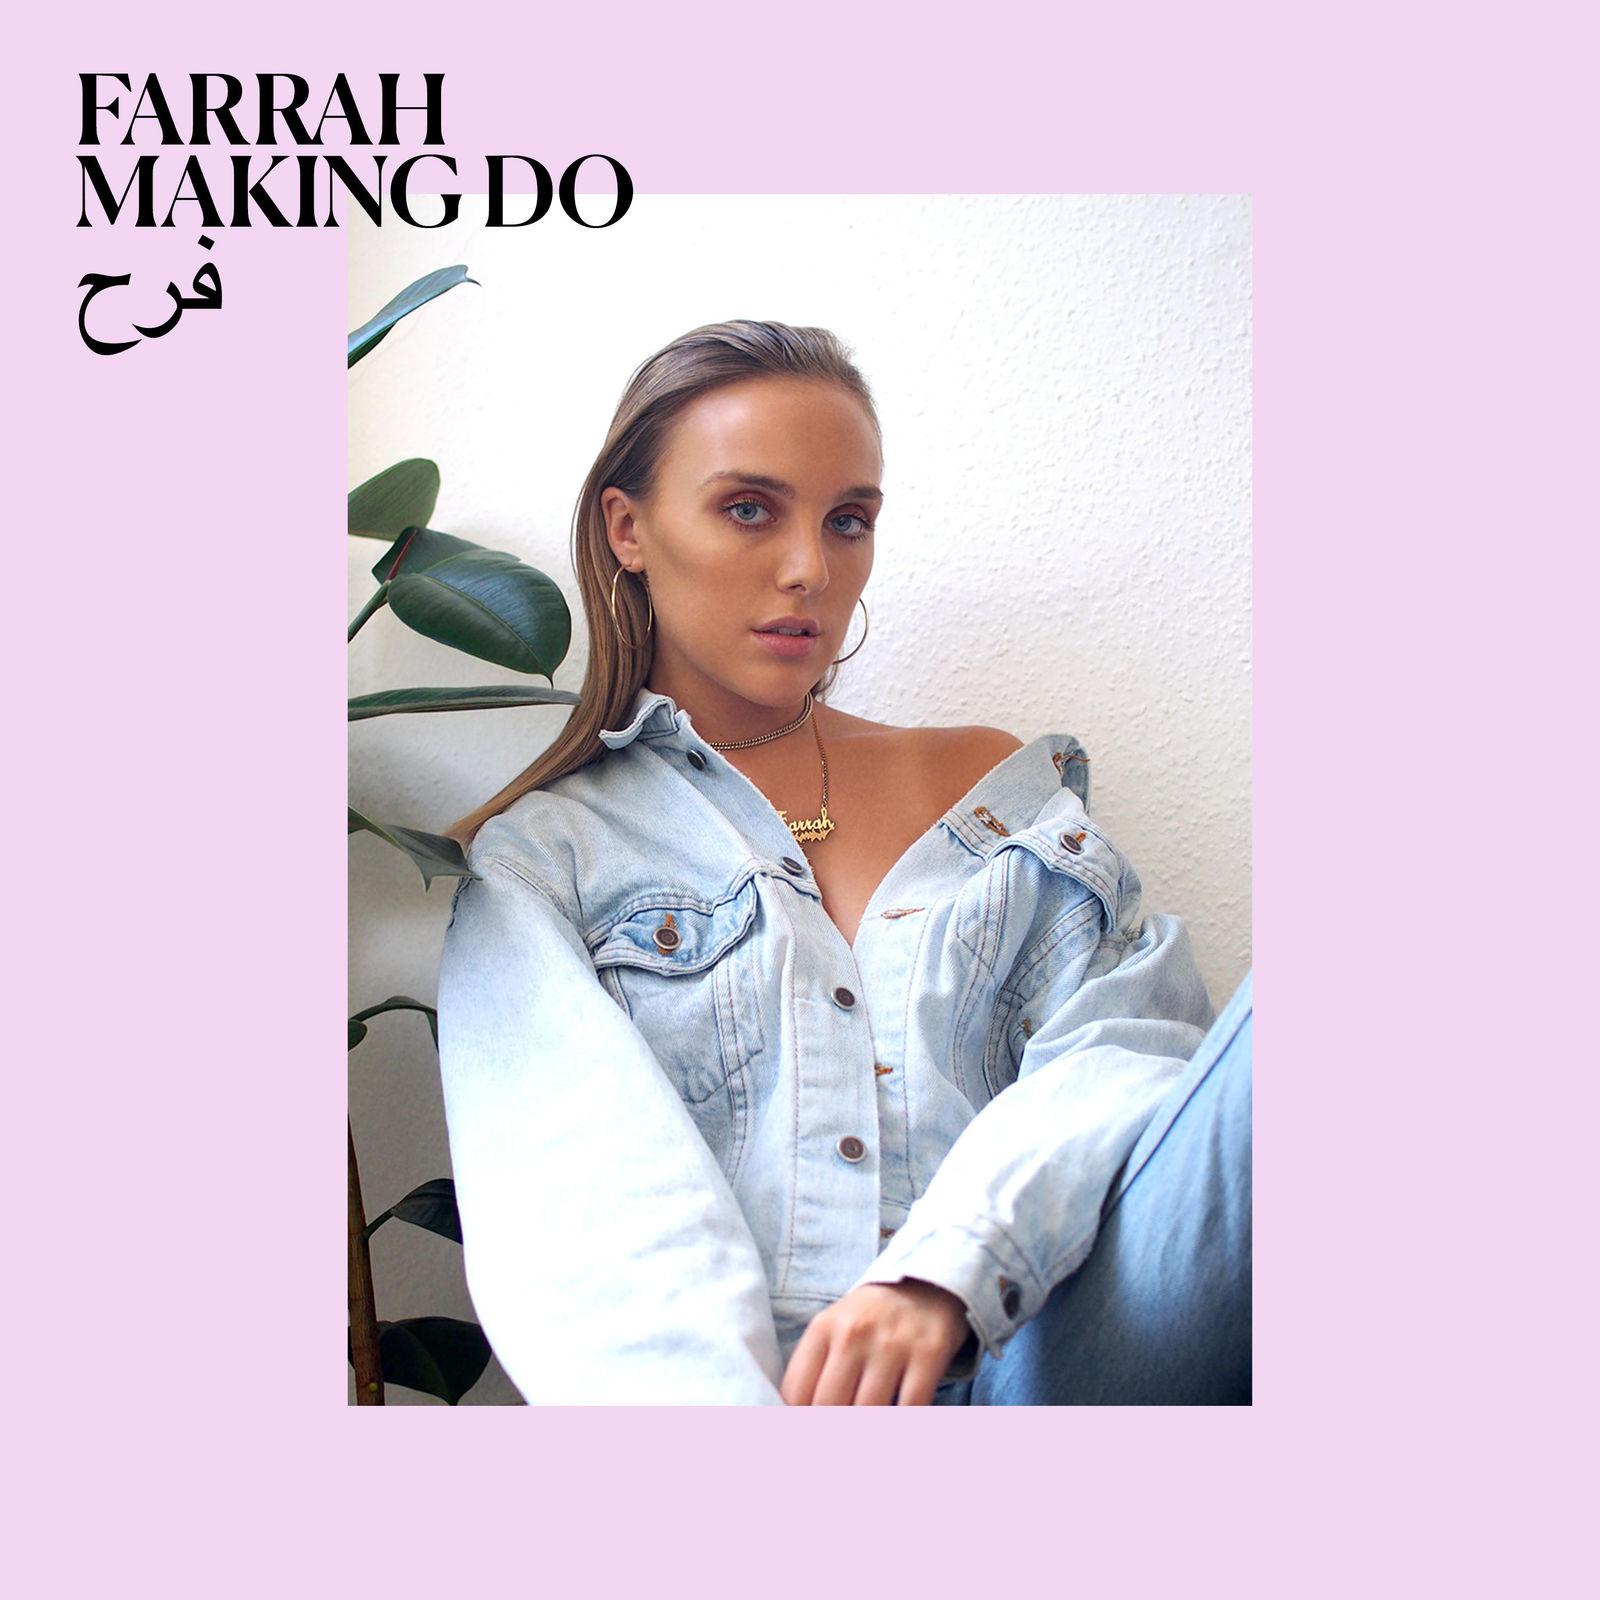 Farrah - Making Do